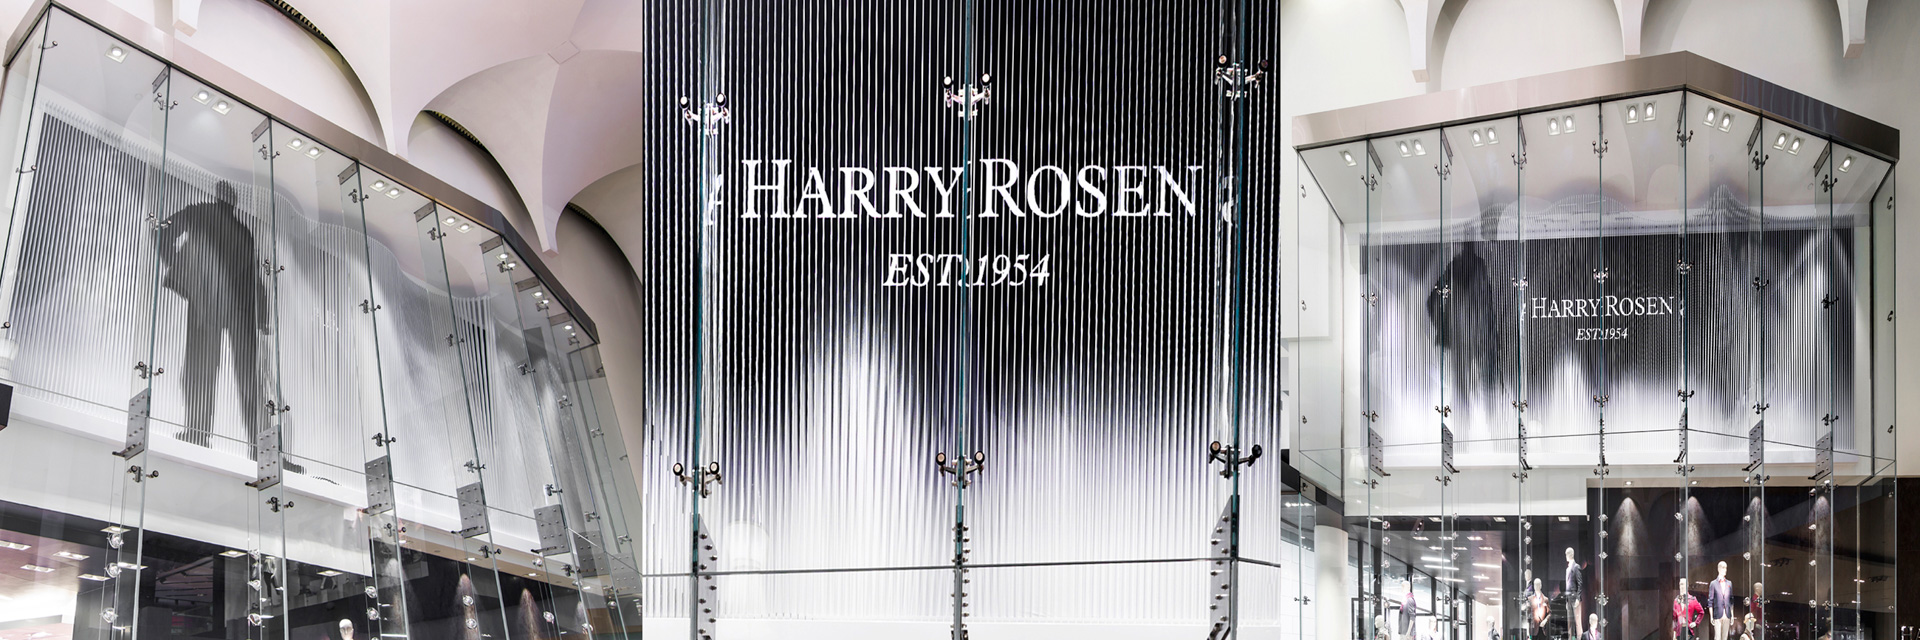 portfolio harry rosen